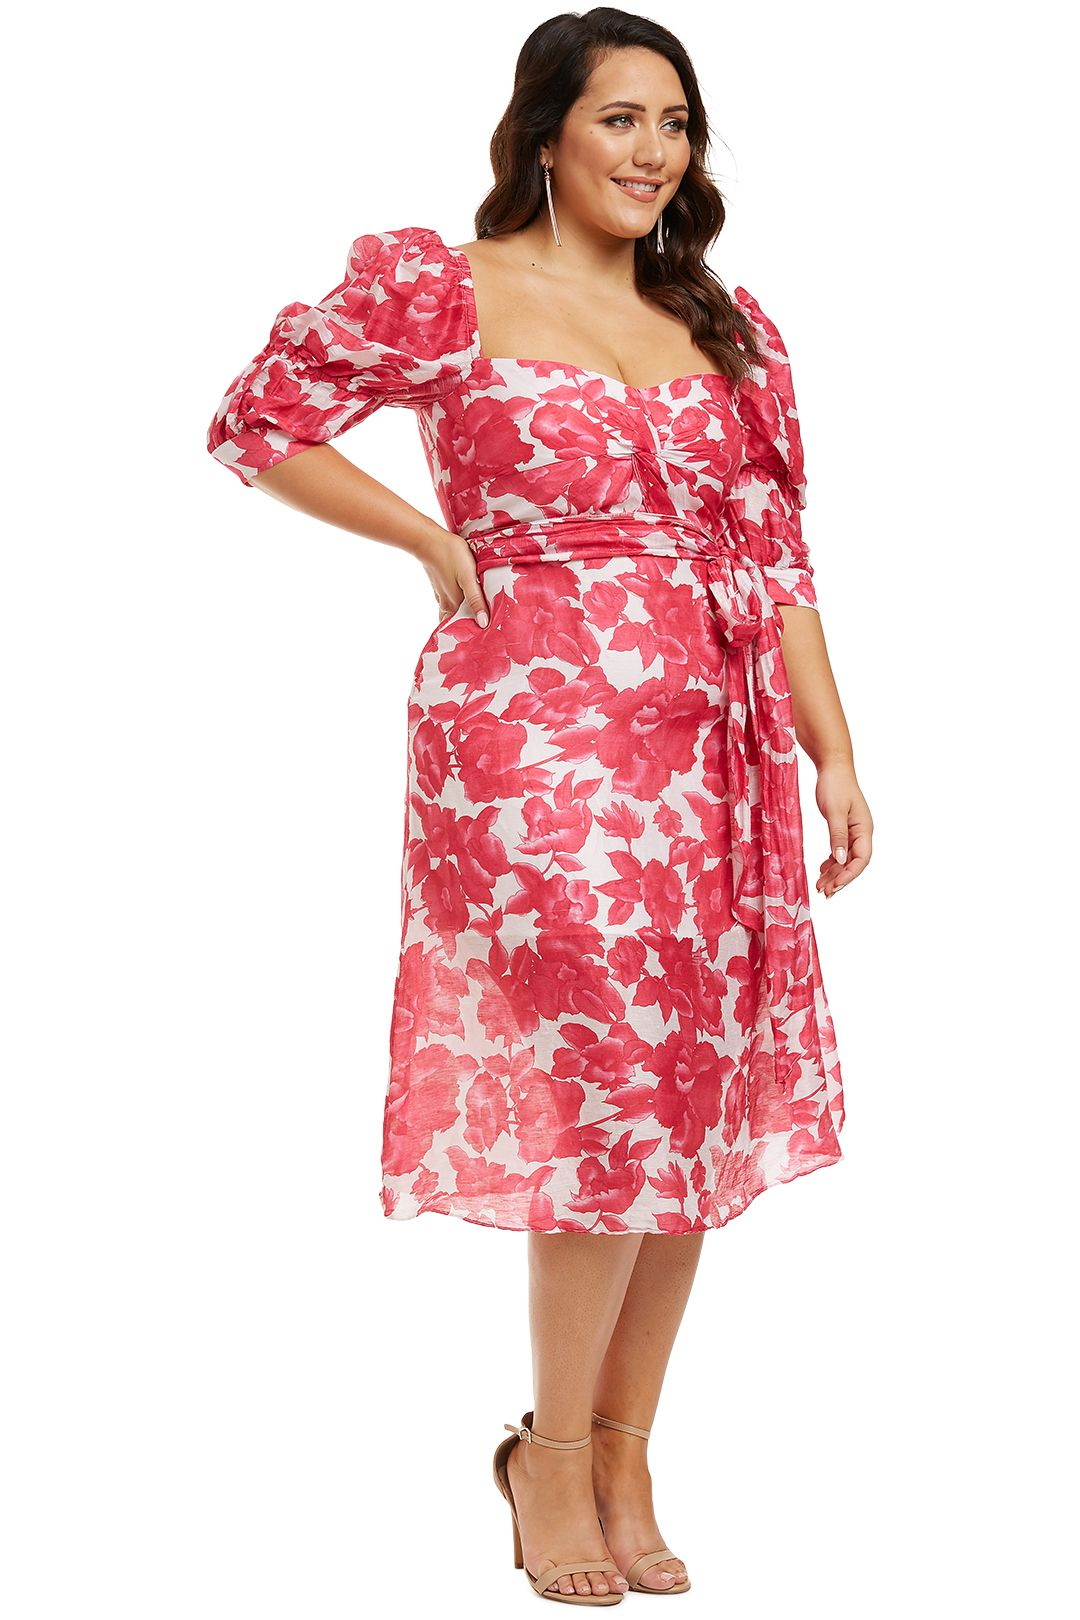 Talulah-Martini-Midi-Dress-Raspberry-Martini-Floral-Side